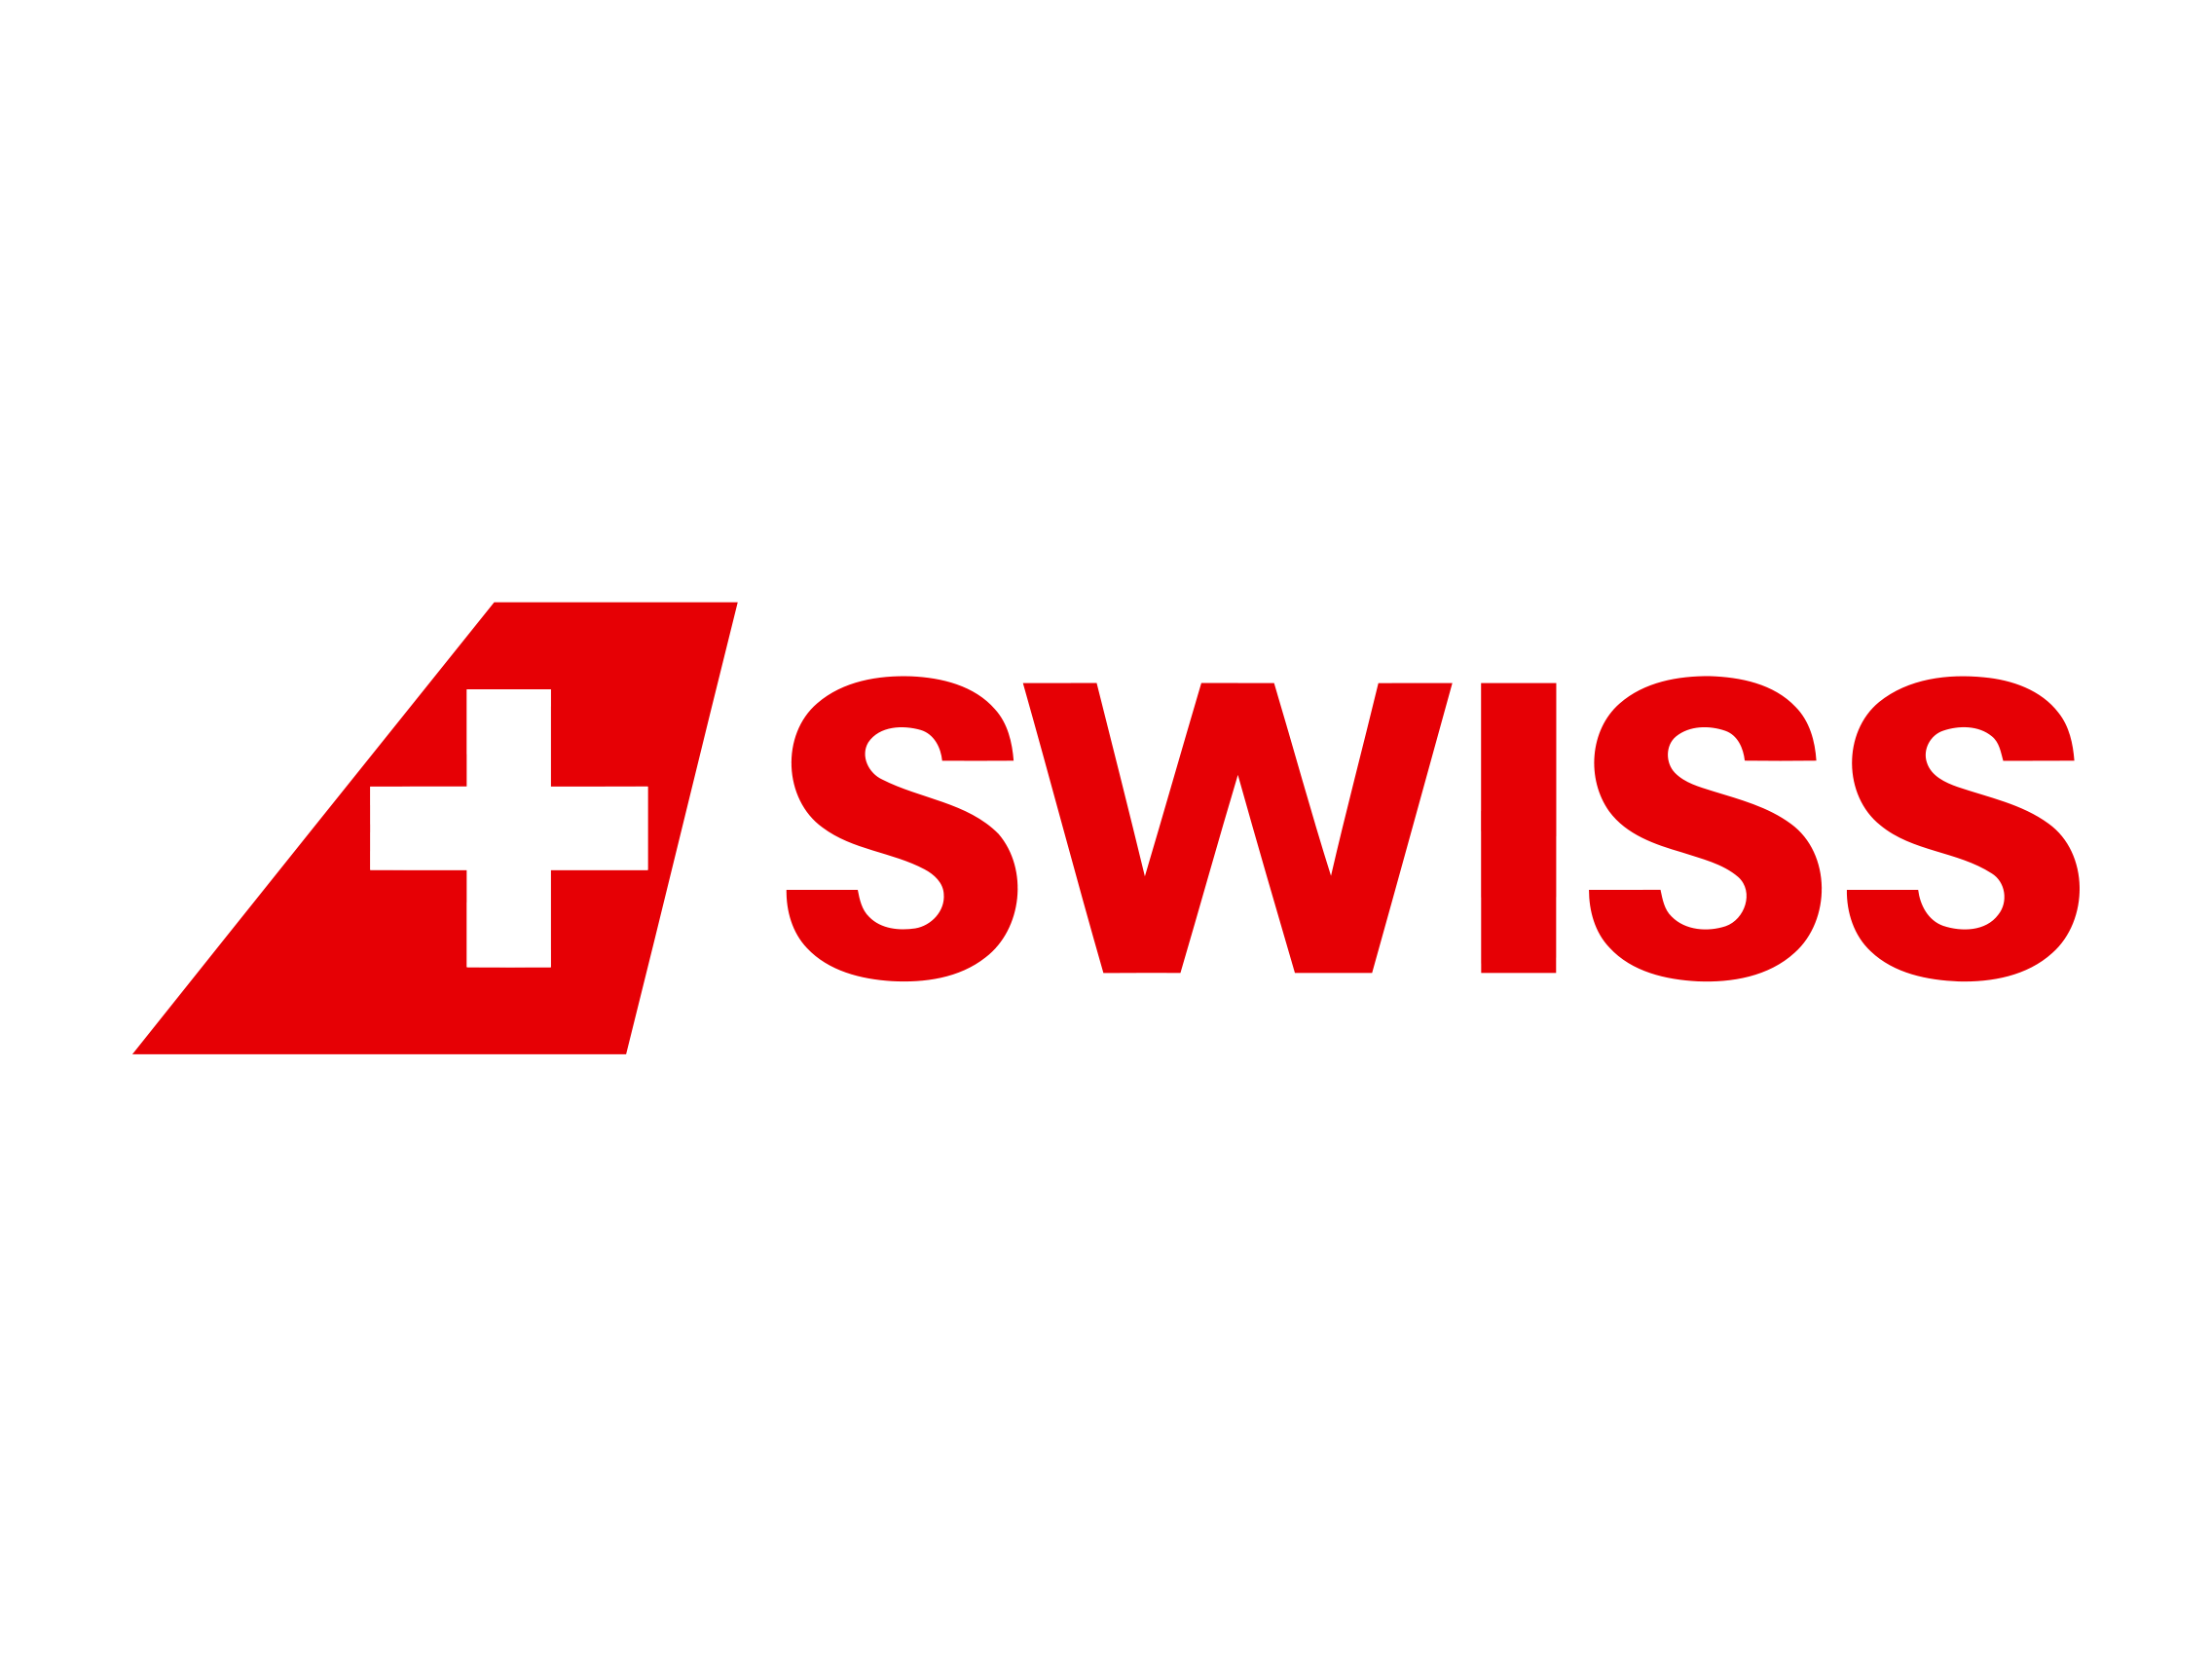 Swiss-International-Air-Lines-logo.png (2272×1704) | Logos | Pinterest |  Logos - Swiss International Air Lines PNG